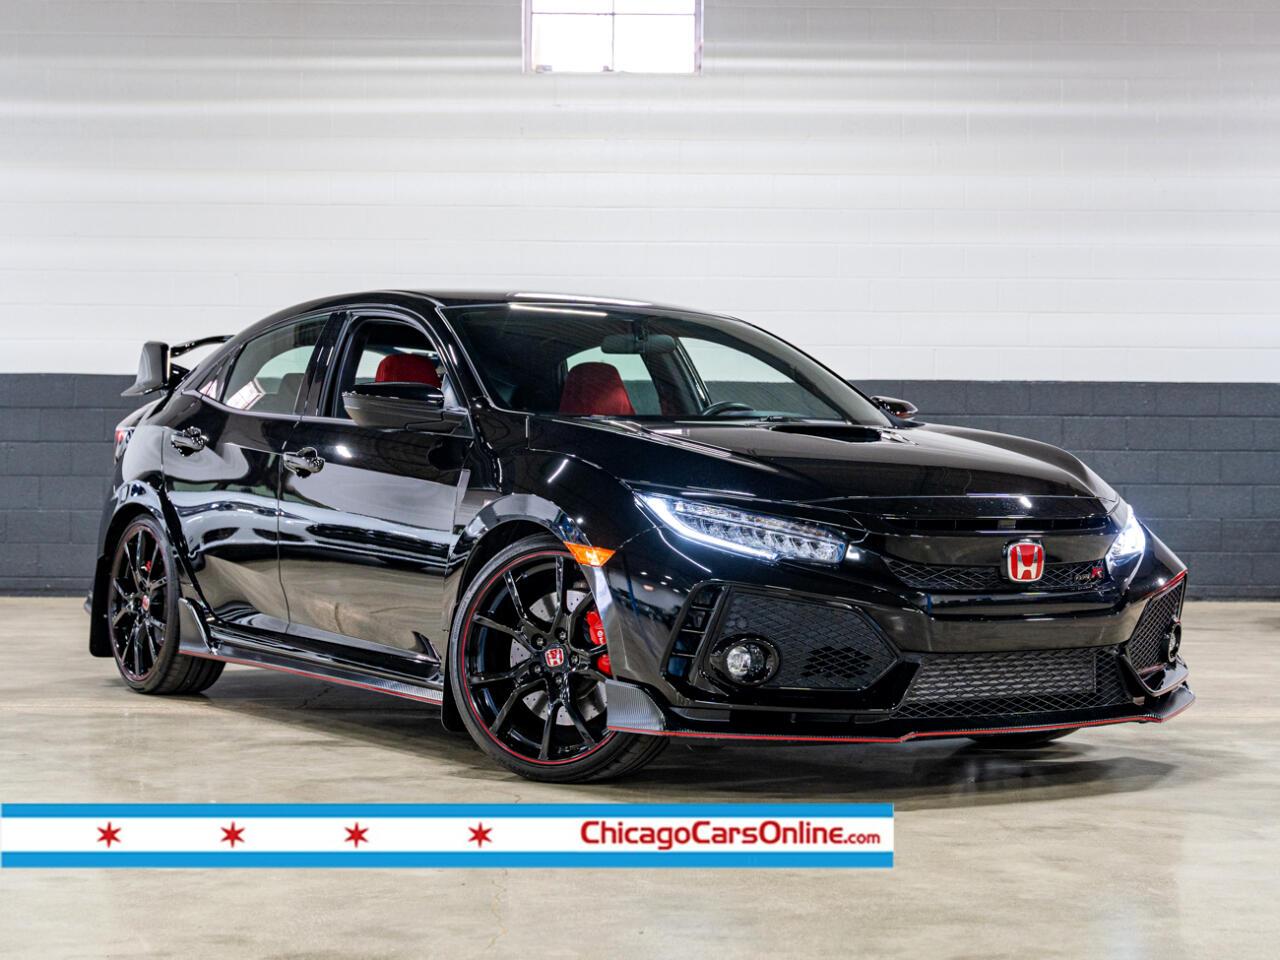 Honda Civic Type R 6M 2019